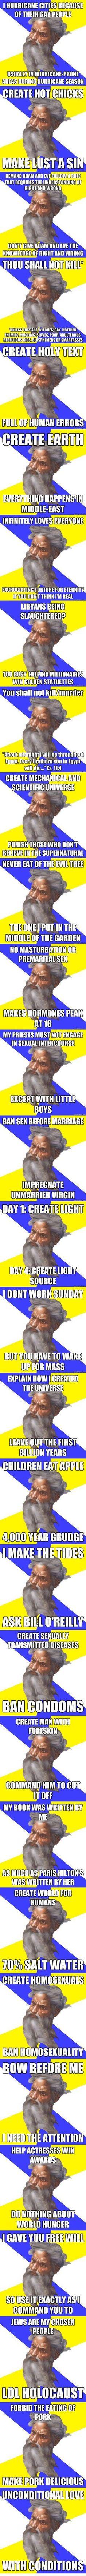 It all makes sense. #god #meme #religion Advice God http://knowyourmeme.com/memes/advice-god